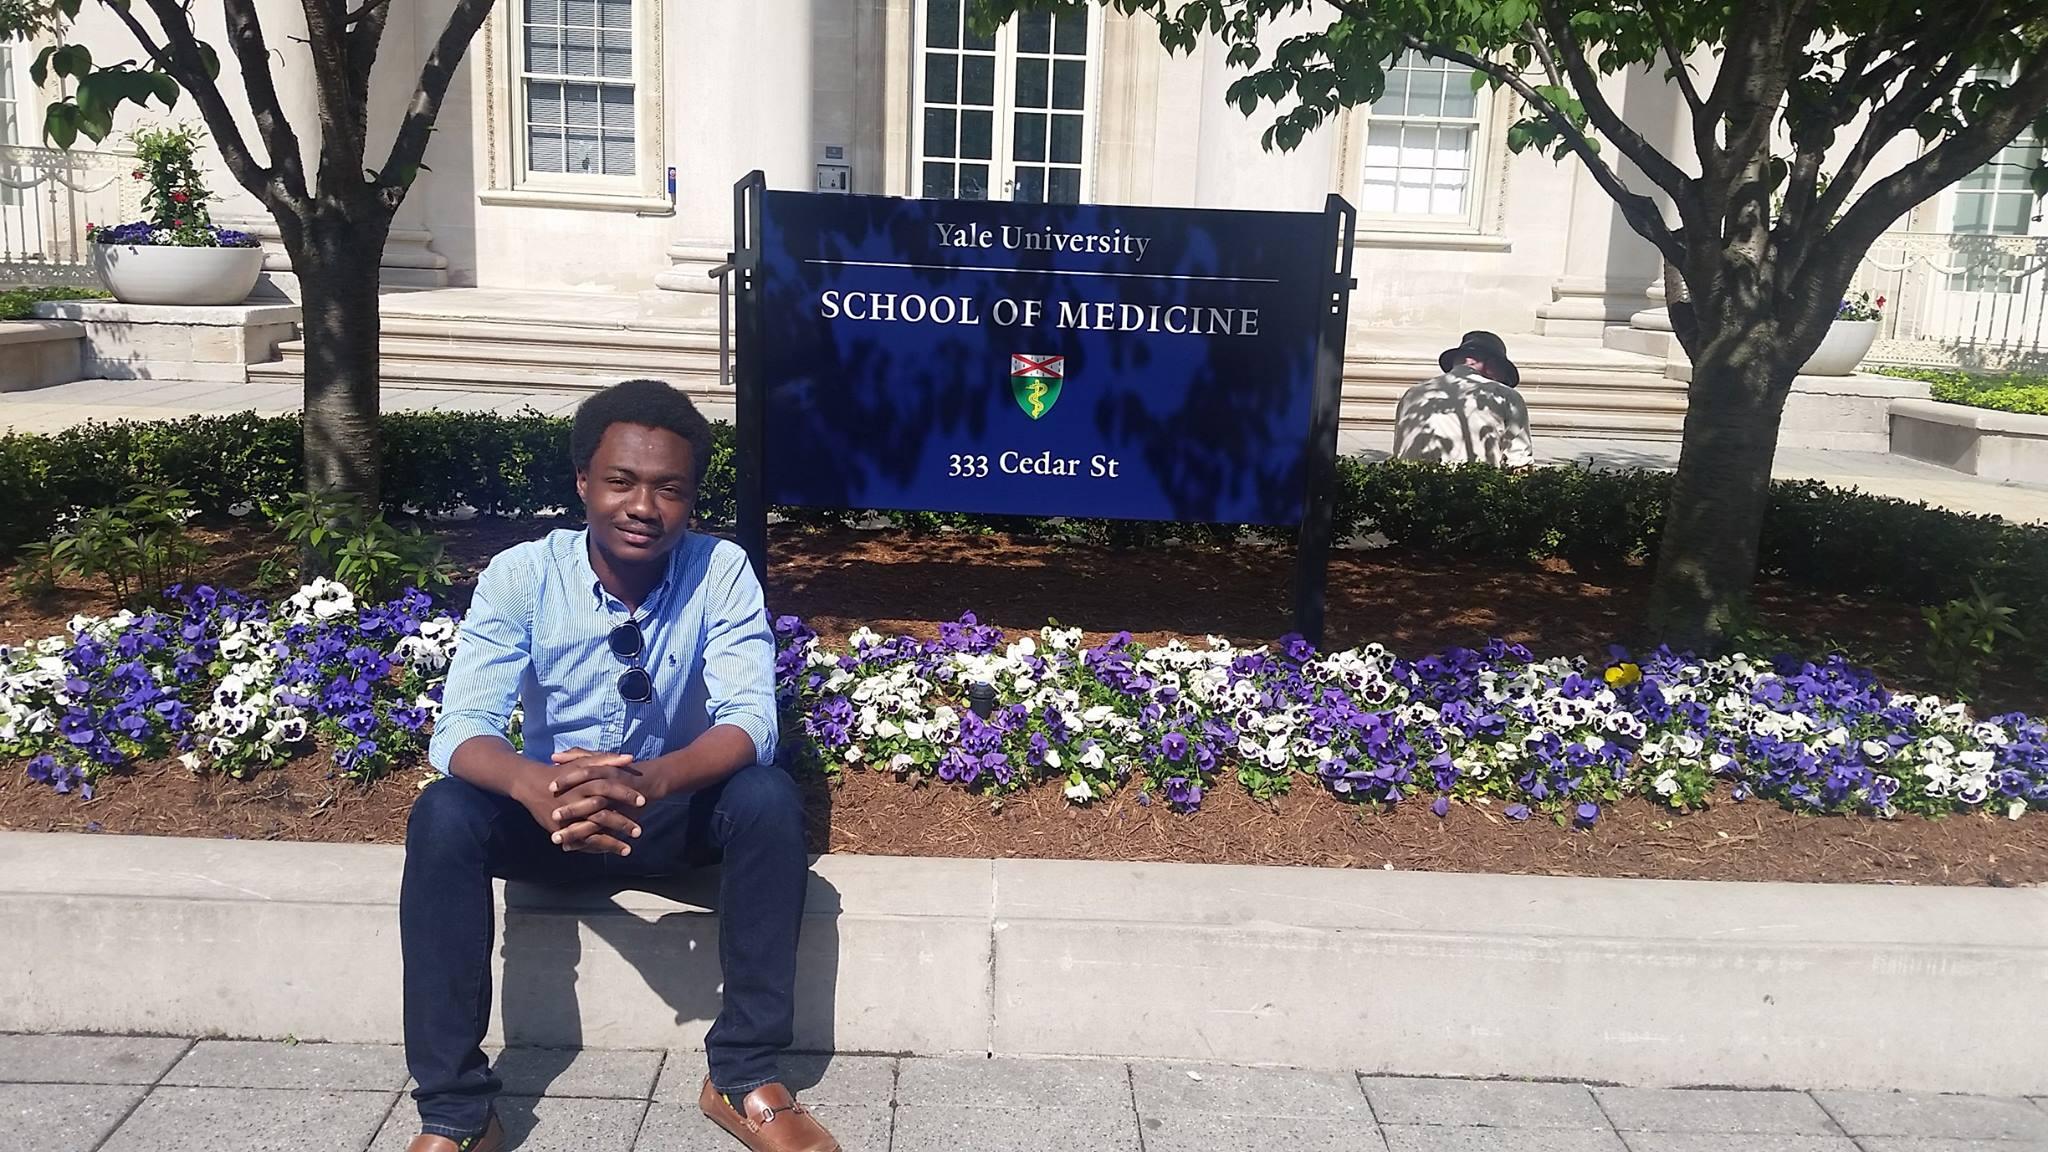 Yale study abroad programs